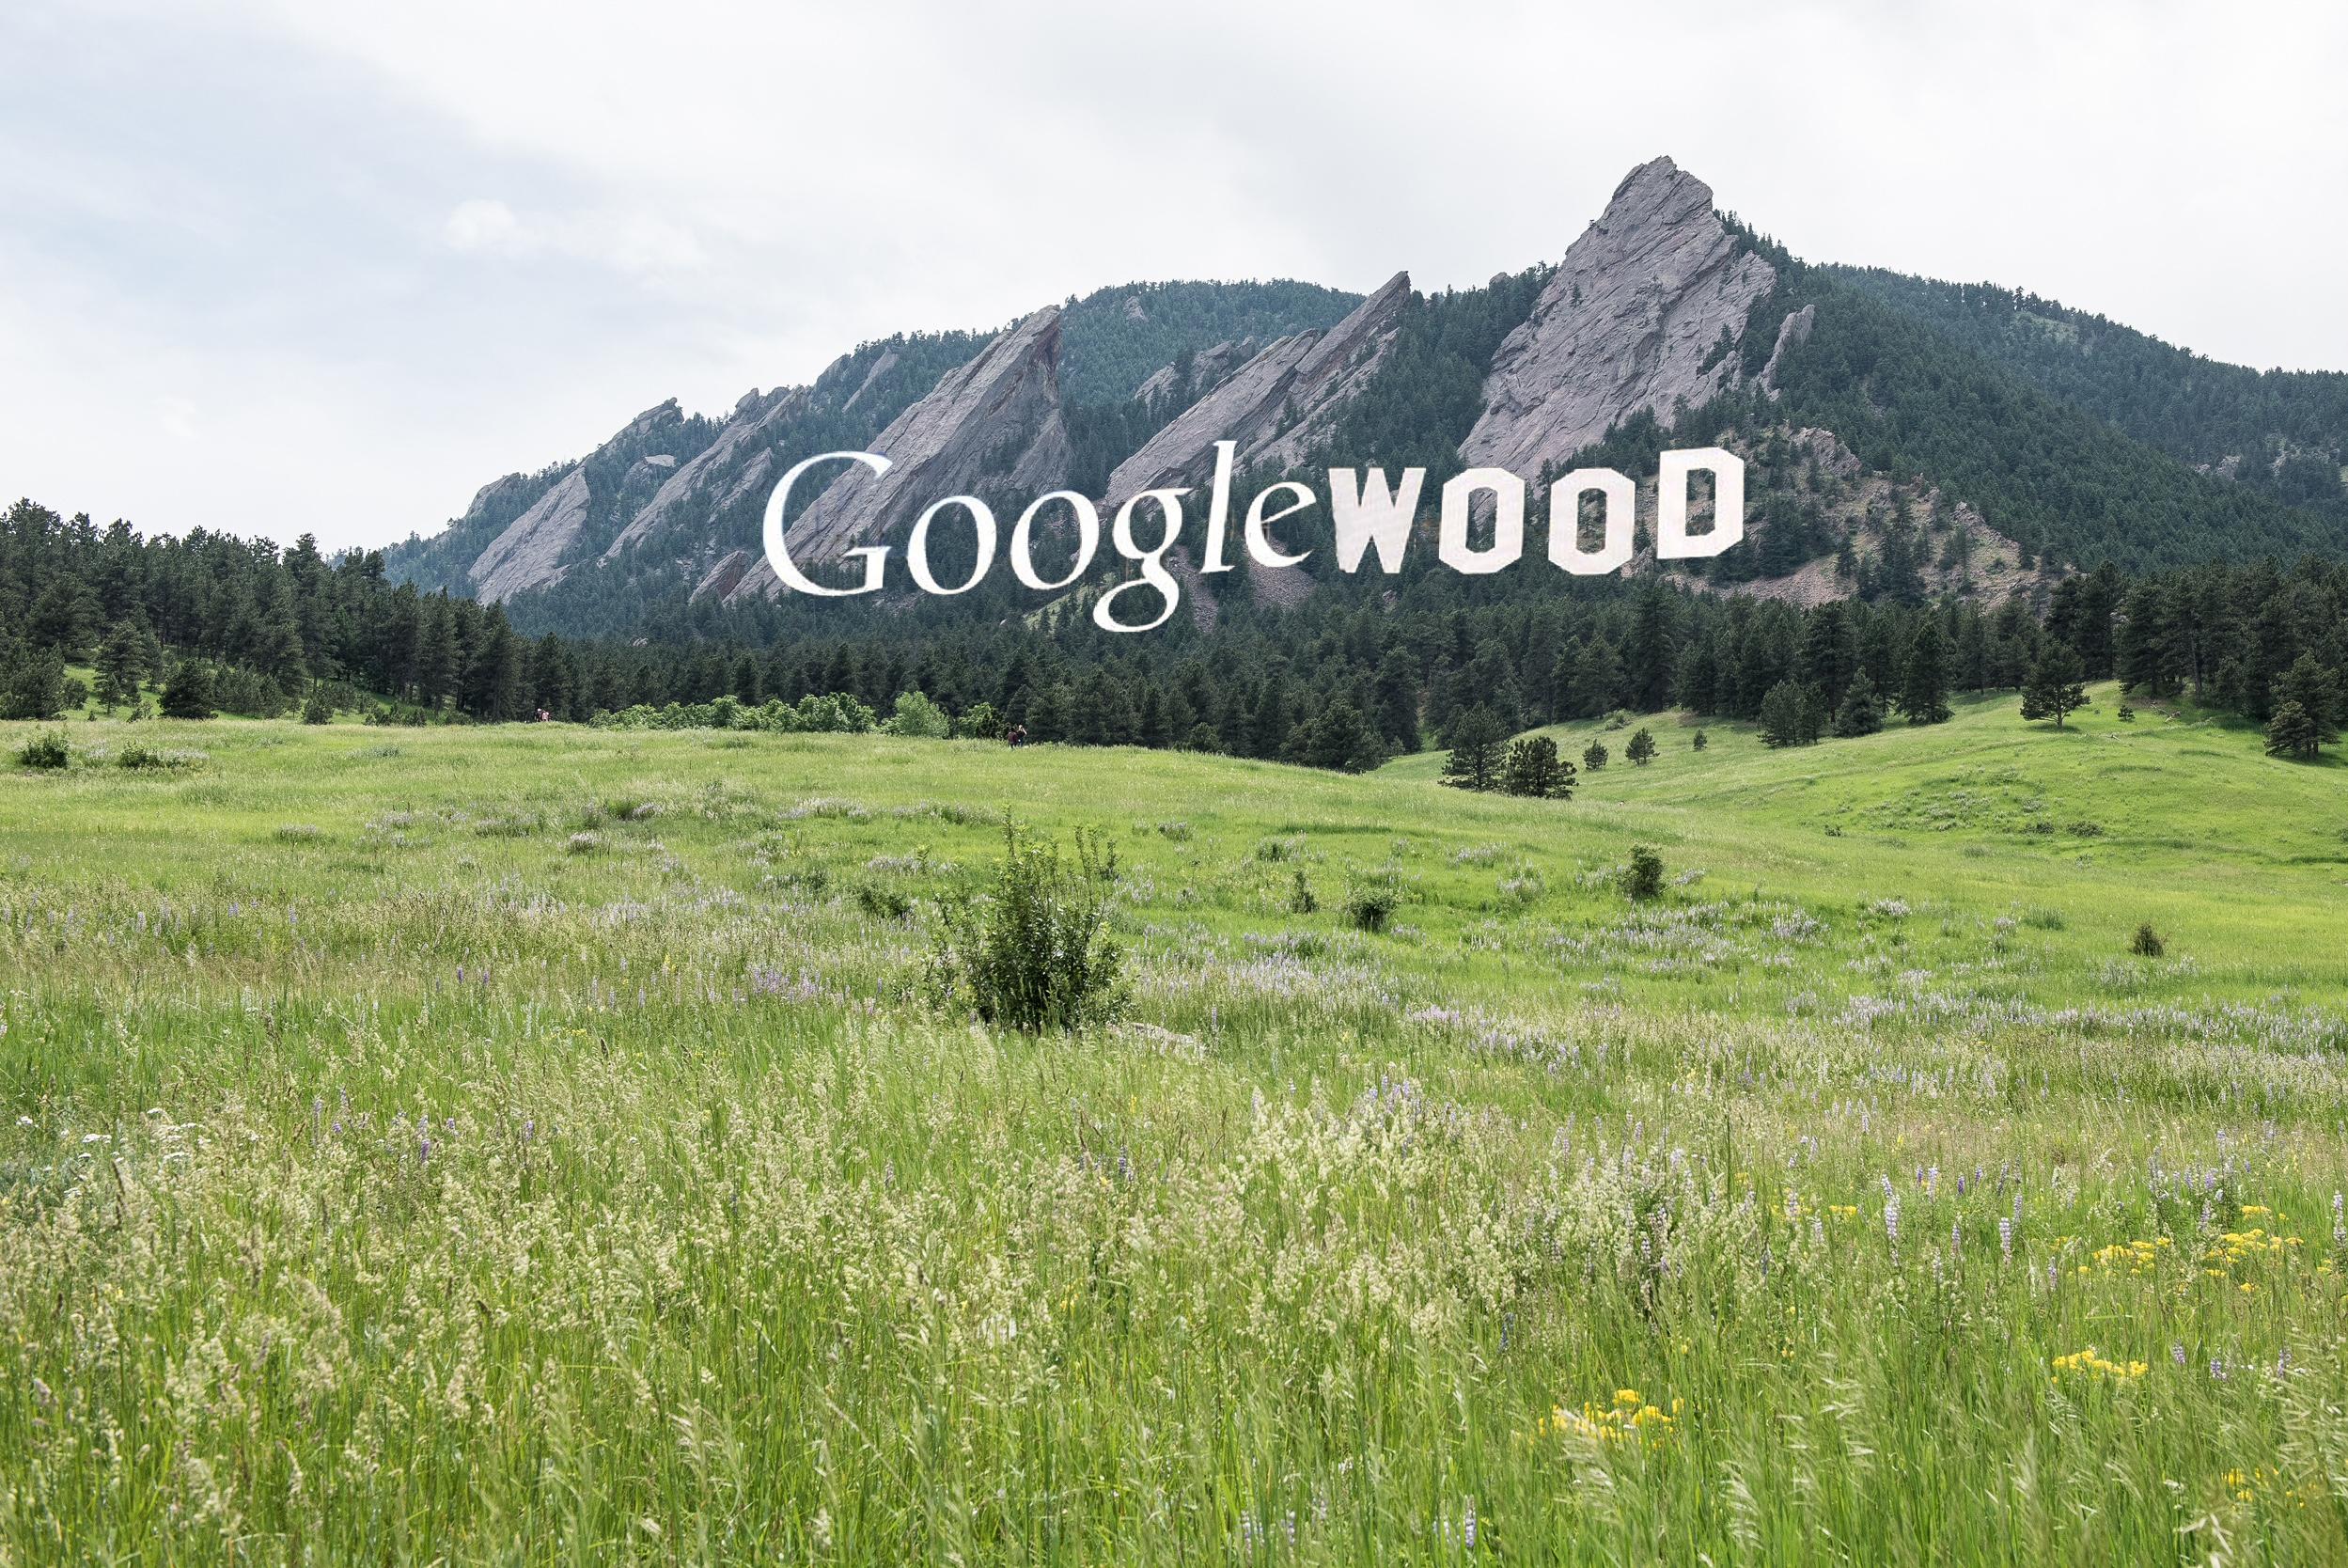 Boulder-GoolgeWood.jpg